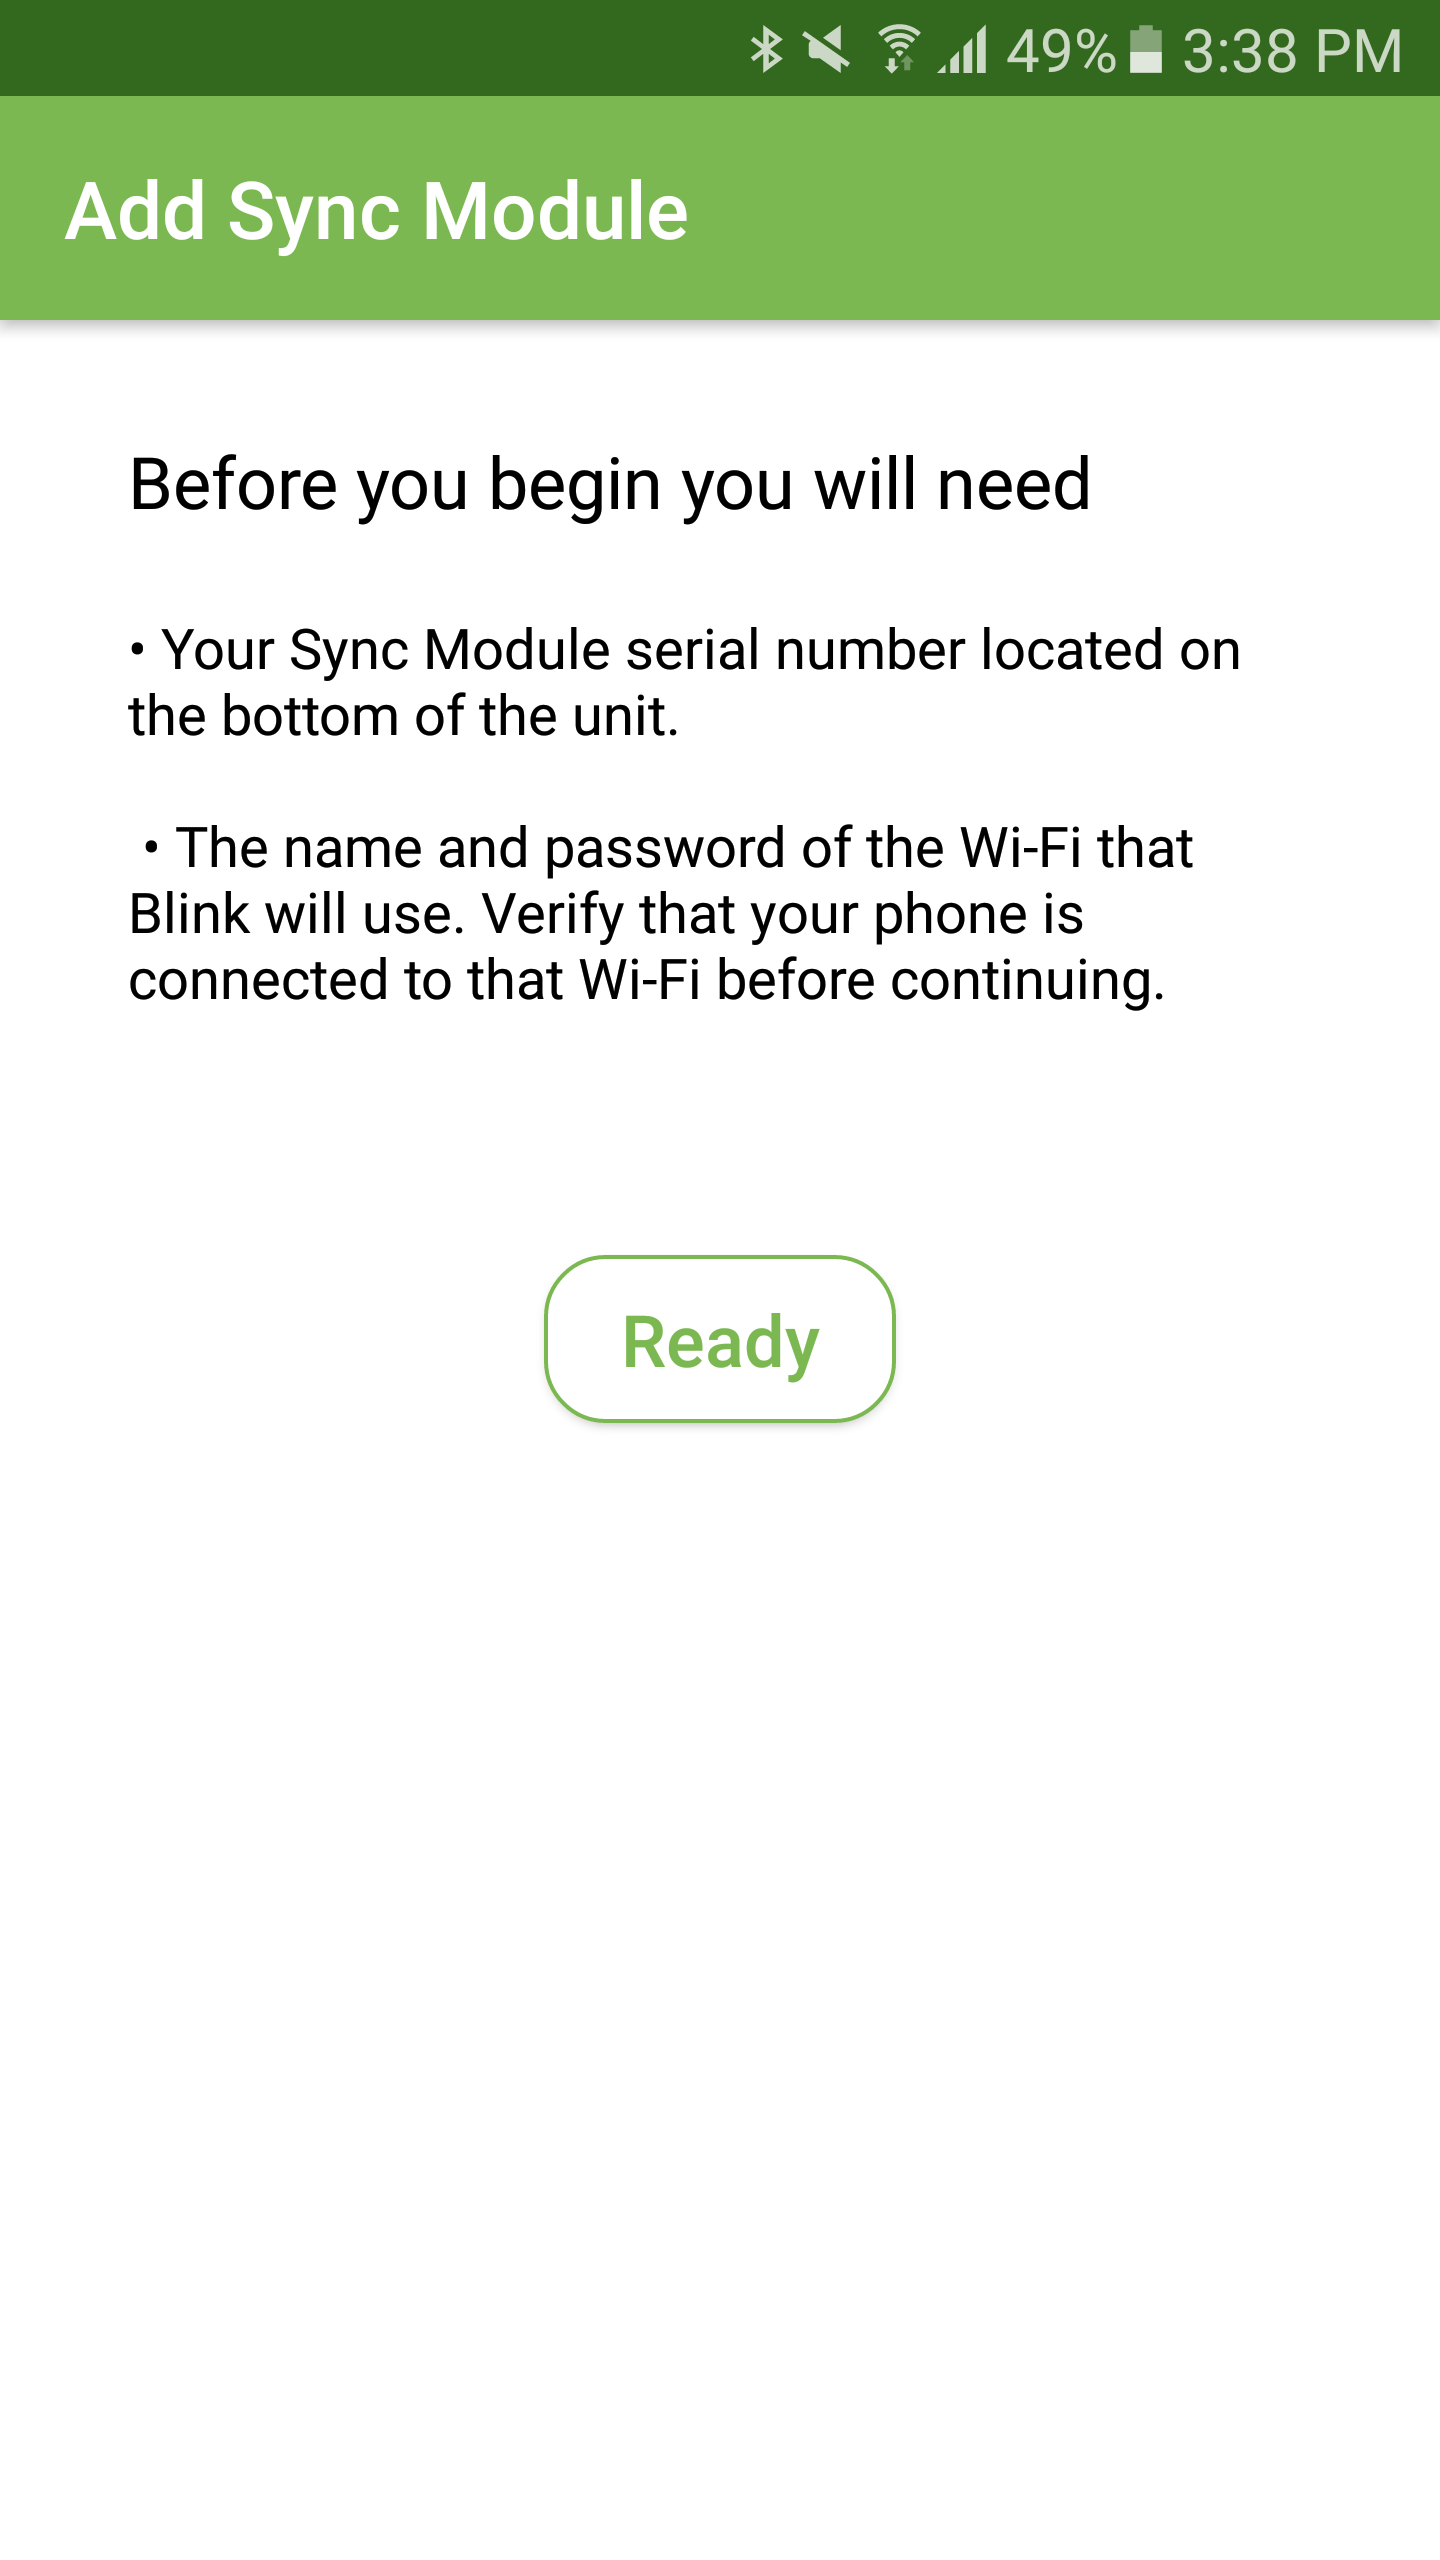 blink-app-setup-sync-module-2